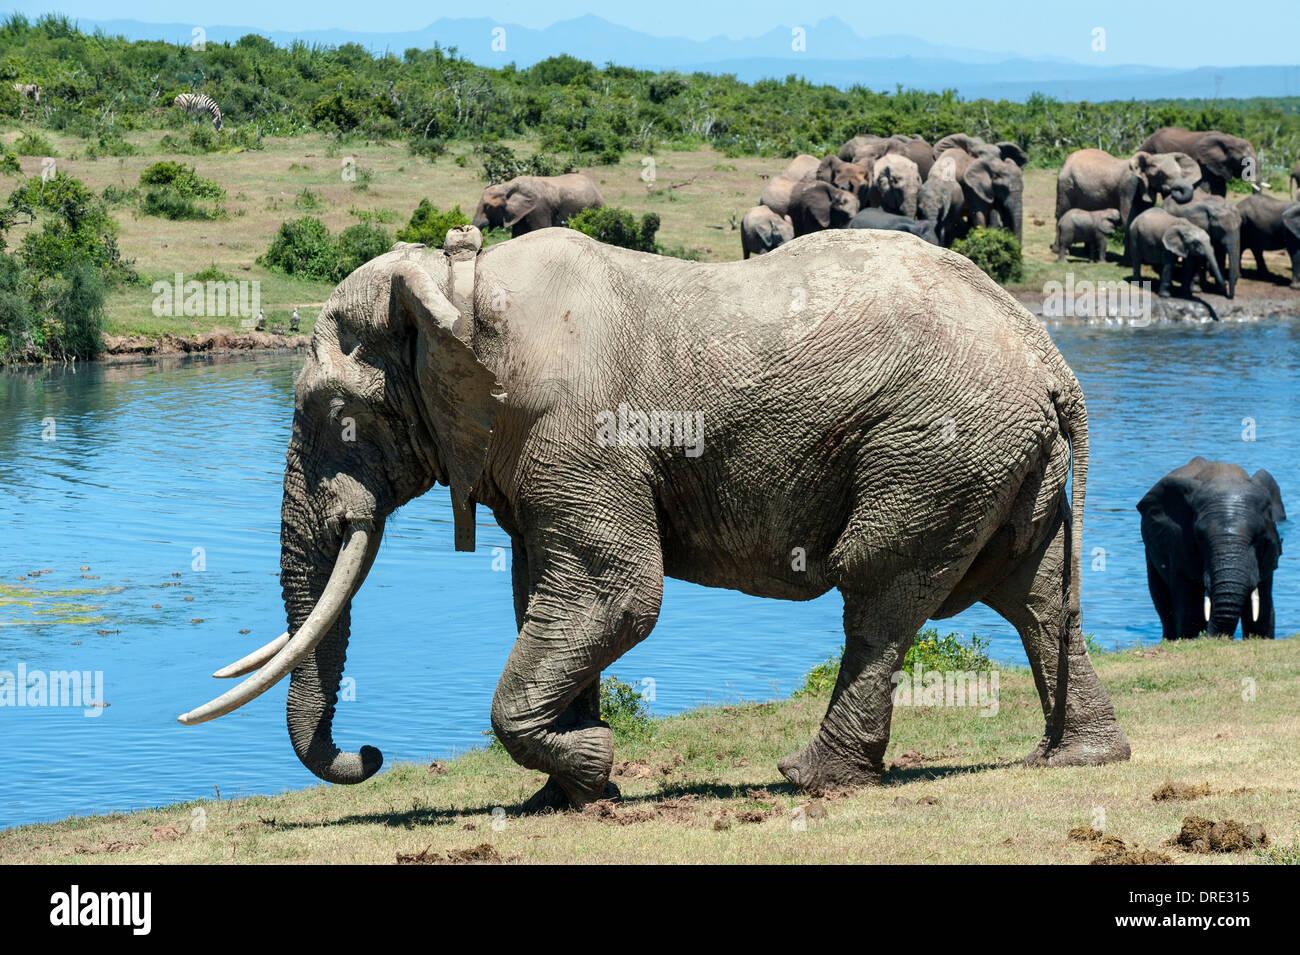 Elefant Stier (Loxodonta Africana), mit tracking-Kragen in Gwarrie Pan Wasserloch, Addo Elephant Park, Eastern Cape, Südafrika Stockbild